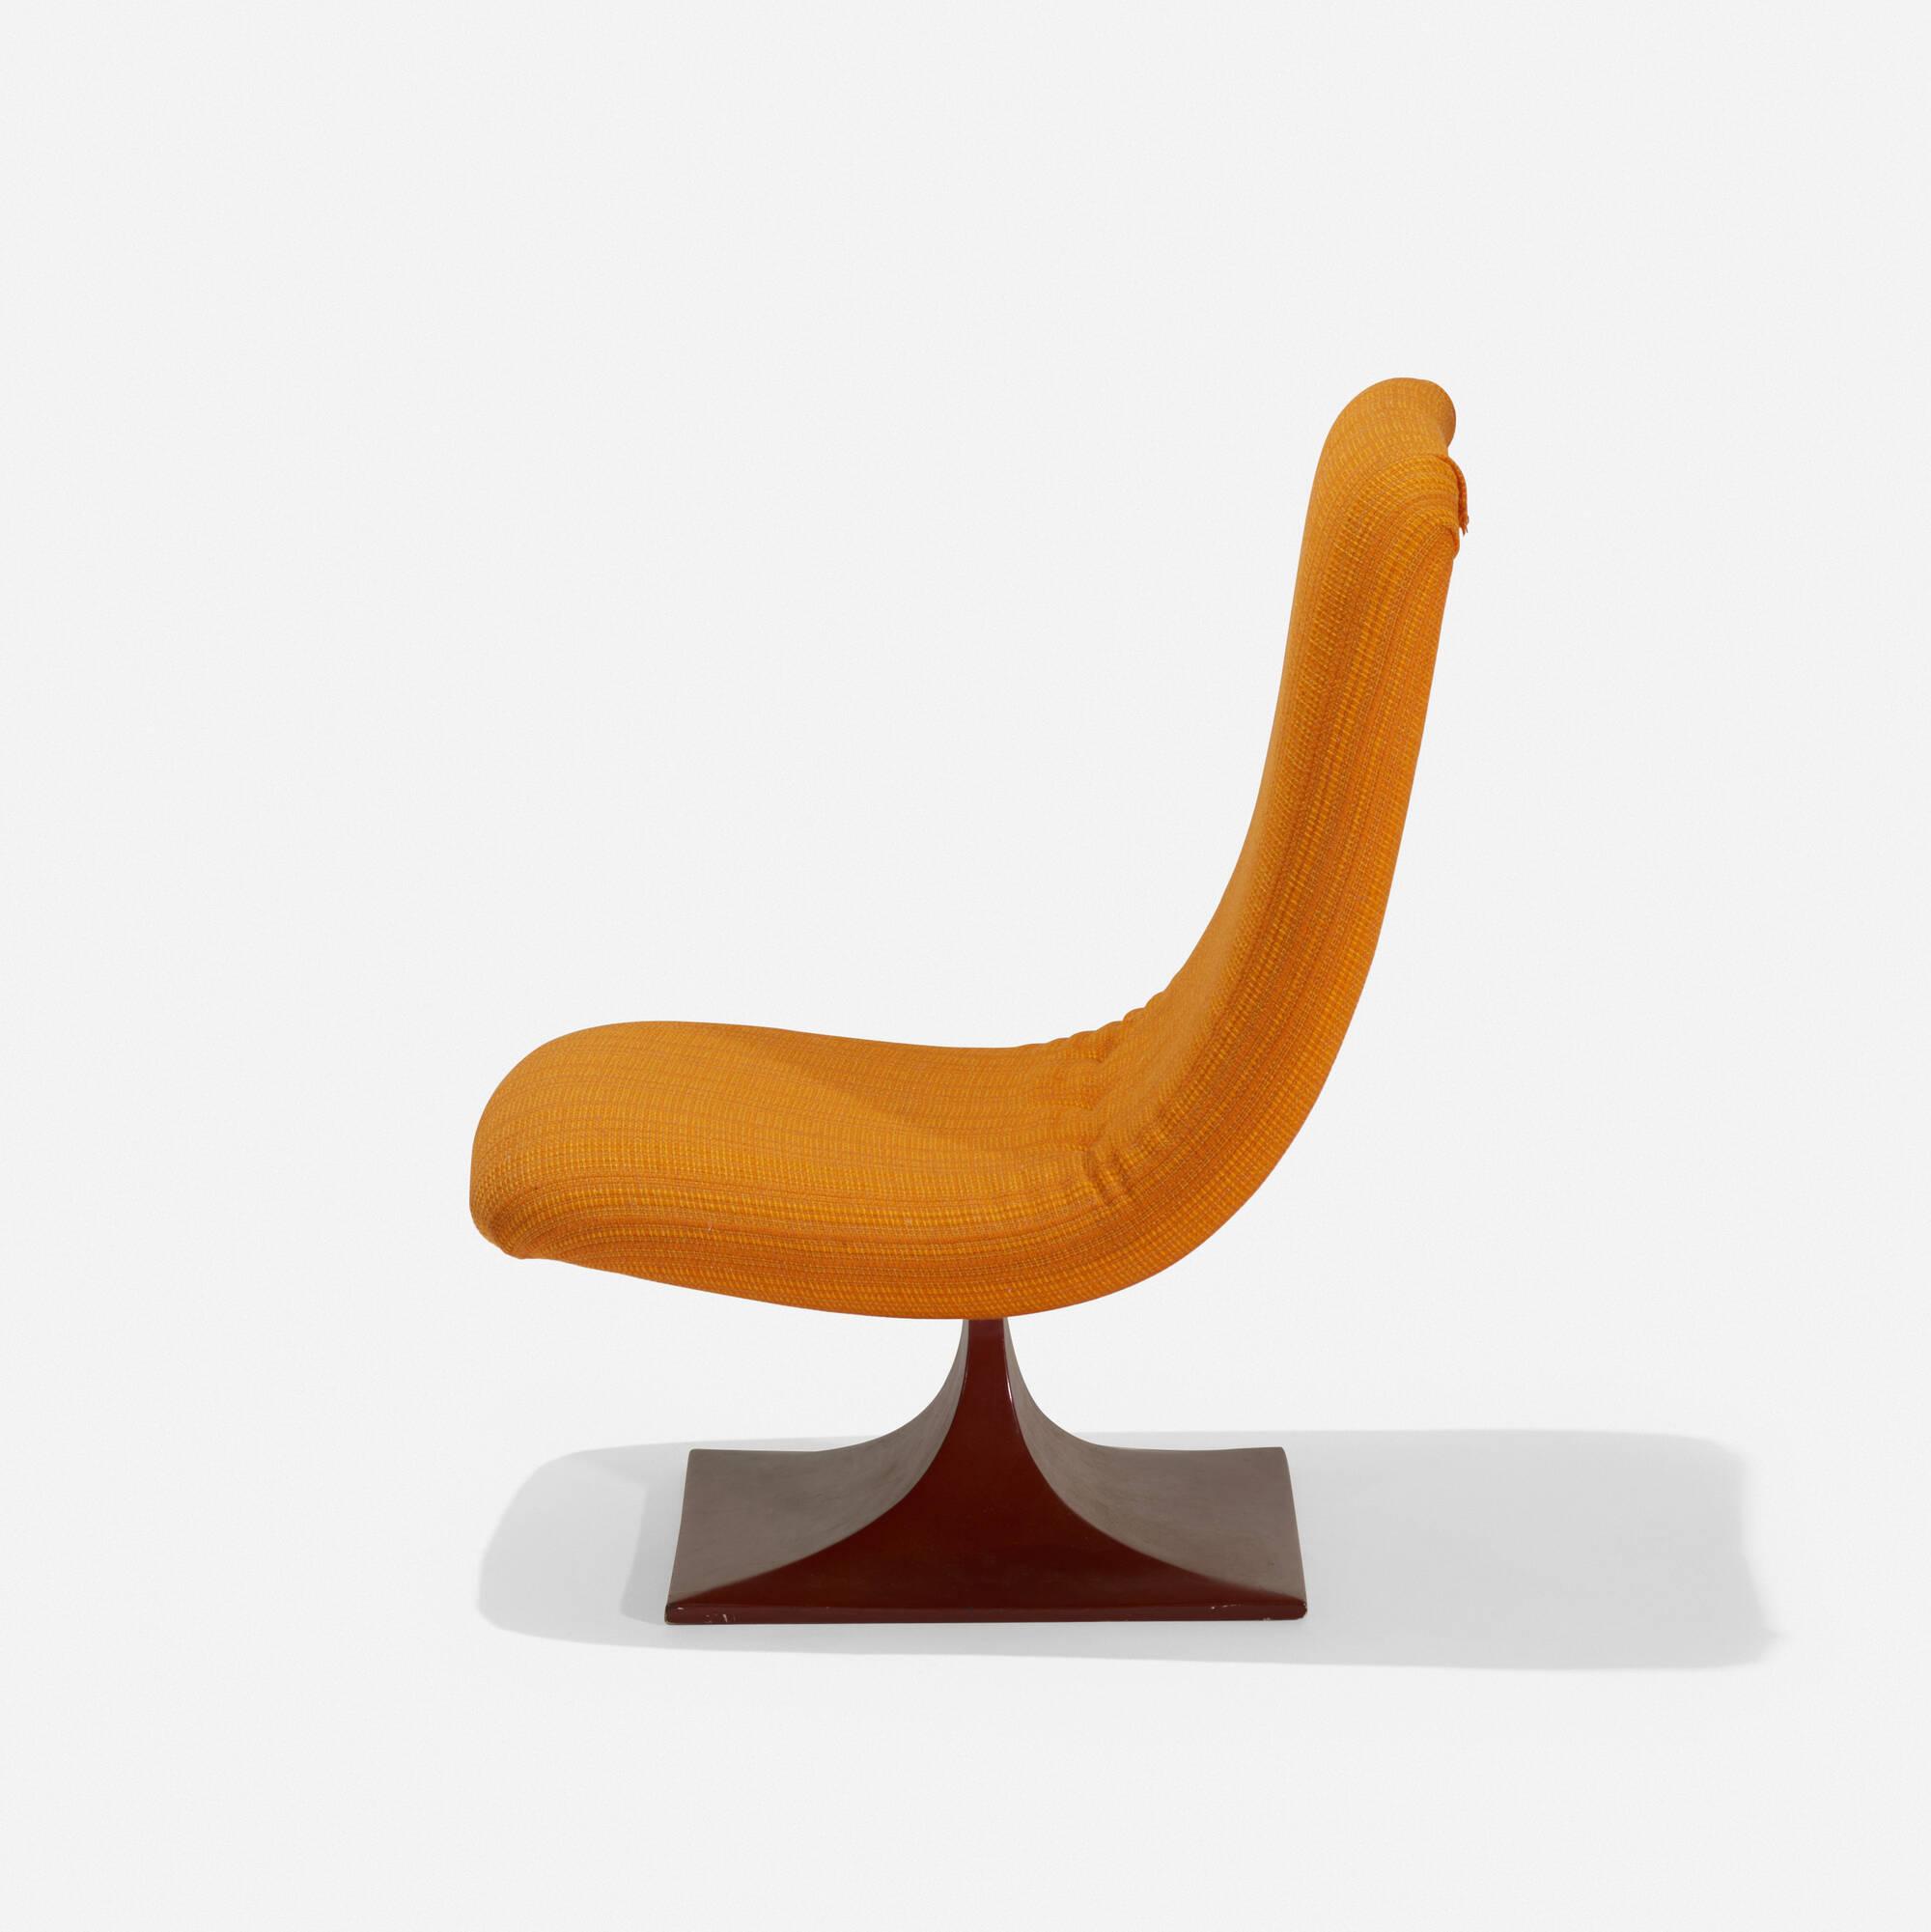 231: Milo Baughman / prototype lounge chair (3 of 3)